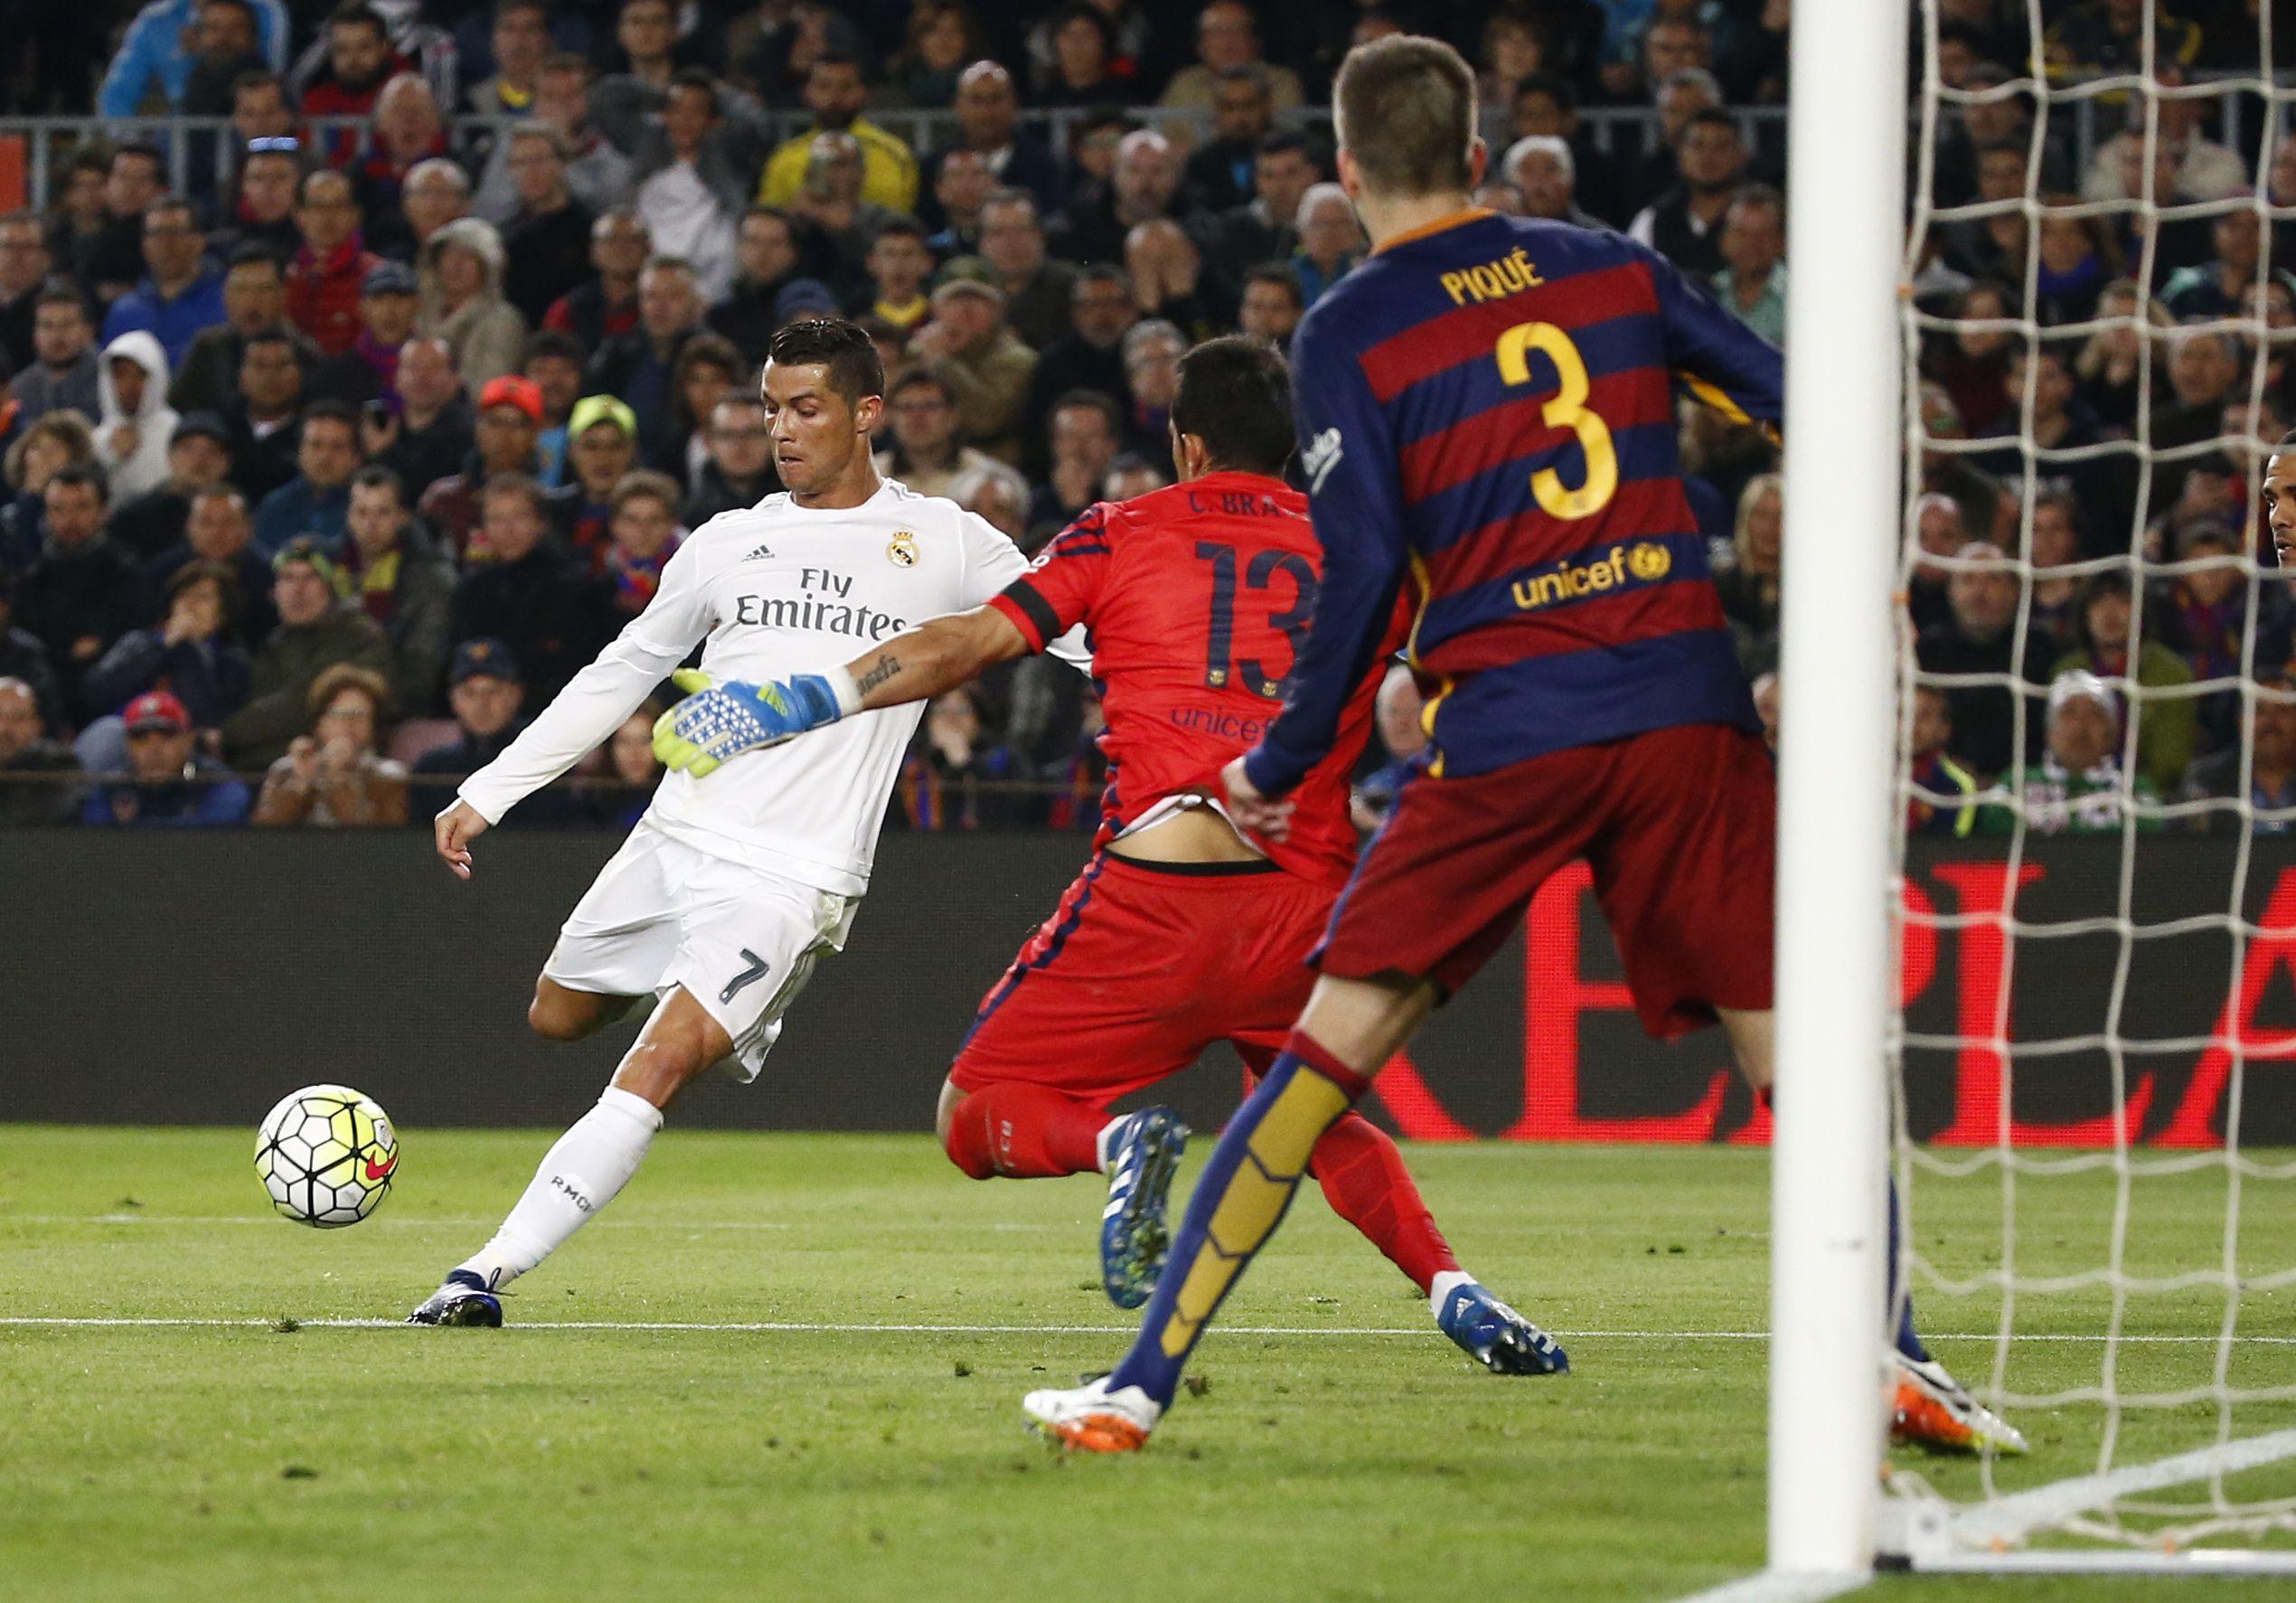 Football Soccer - FC Barcelona v Real Madrid - La Liga - Camp Nou, Barcelona - 2/4/16 Real Madrid's Cristiano Ronaldo scores their second goal Reuters / Juan Medina Livepic EDITORIAL USE ONLY.